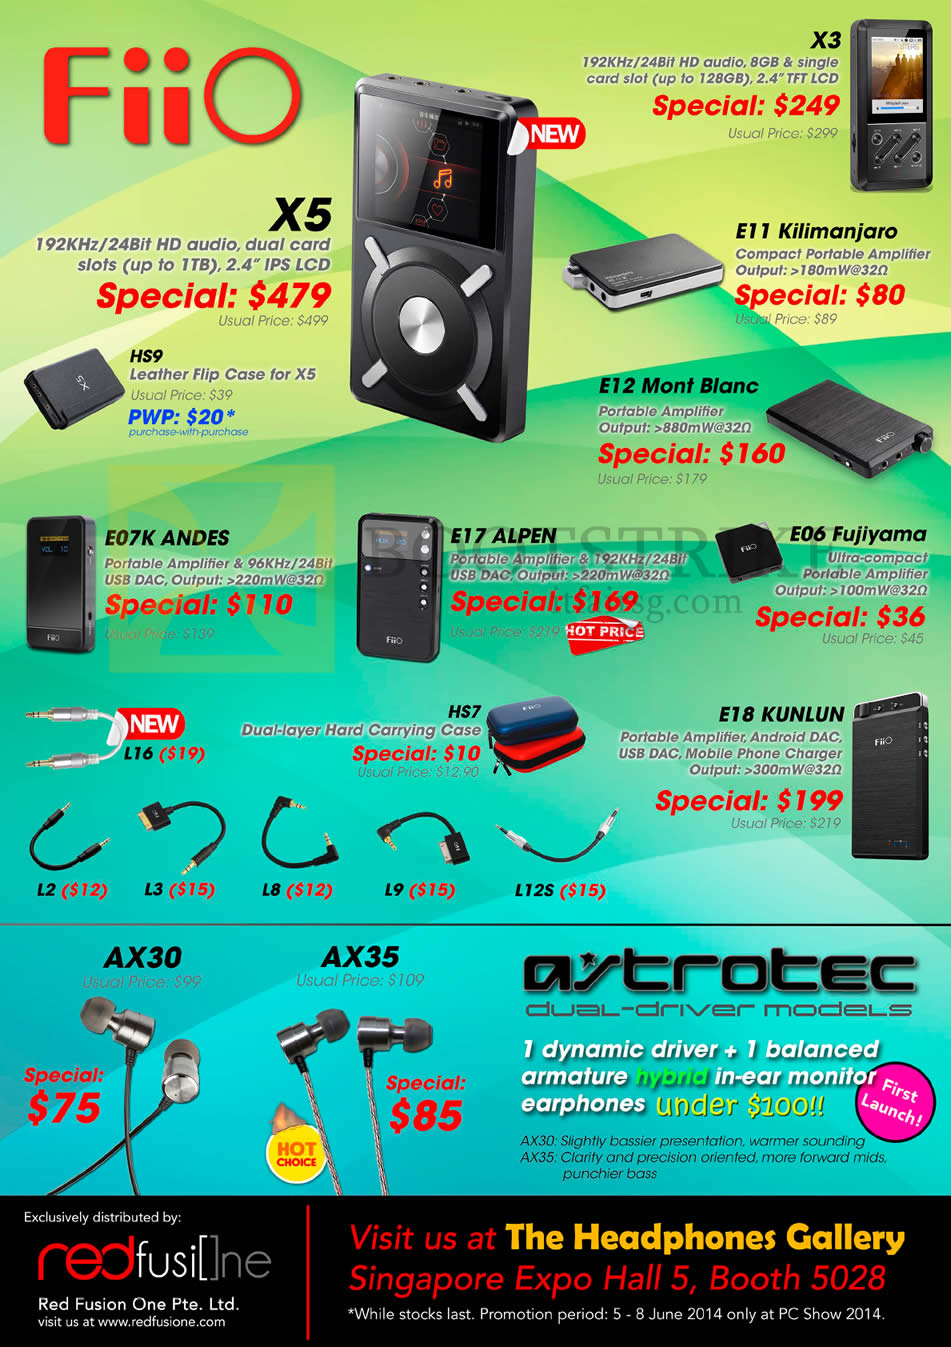 PC SHOW 2014 price list image brochure of The Headphones Gallery FiiO X5 Player, Amplifiers E07K Andes, E17 Alphen, E06, E11, E12, E18 Kunlun, X3, Charger, Astrotec Earphones AX30 AX35